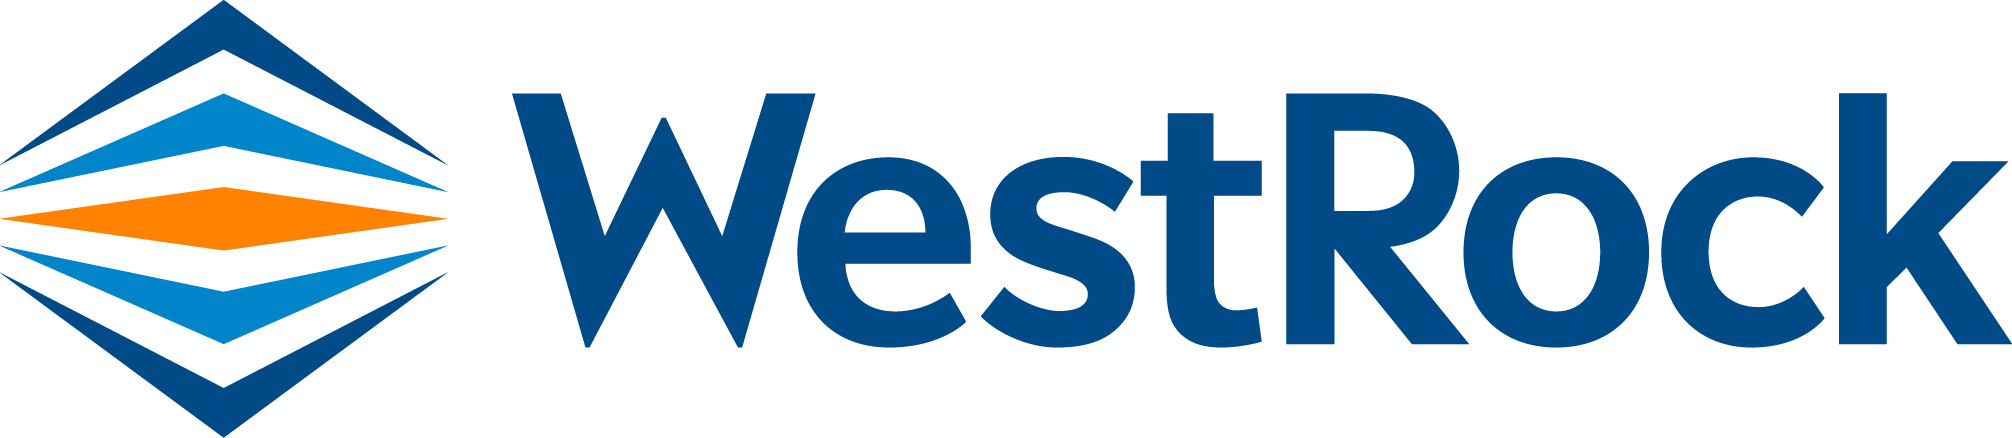 WestRock_logo-2.png